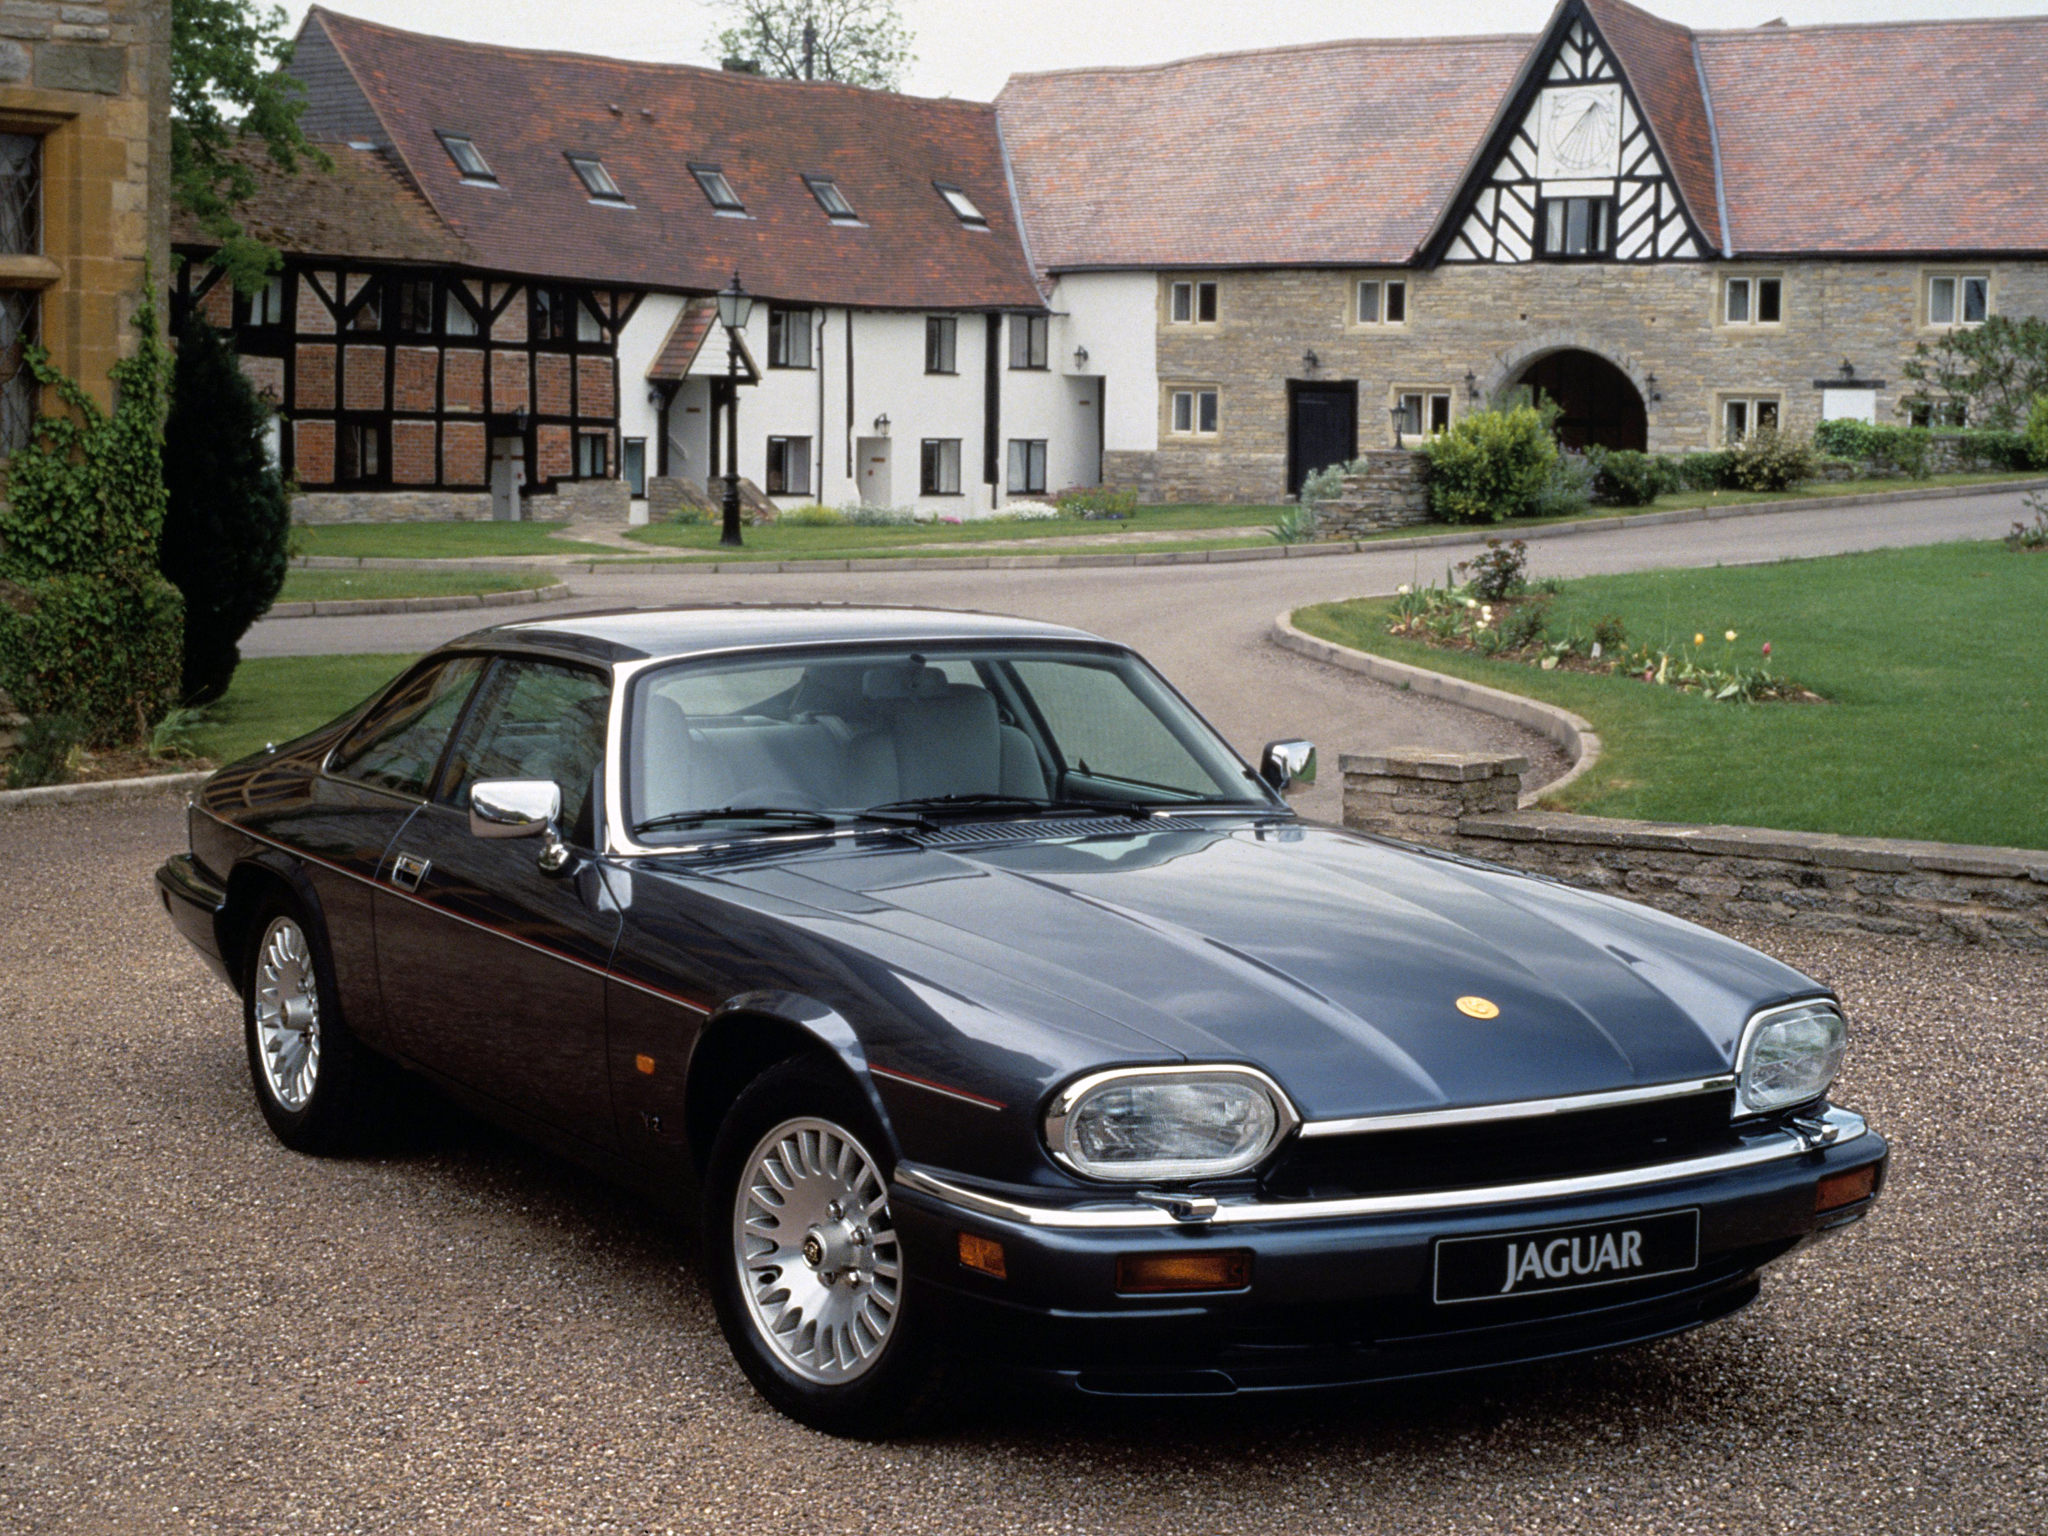 1996 jaguar xjs luxury d wallpaper 2048x1536 151430 wallpaperup. Black Bedroom Furniture Sets. Home Design Ideas